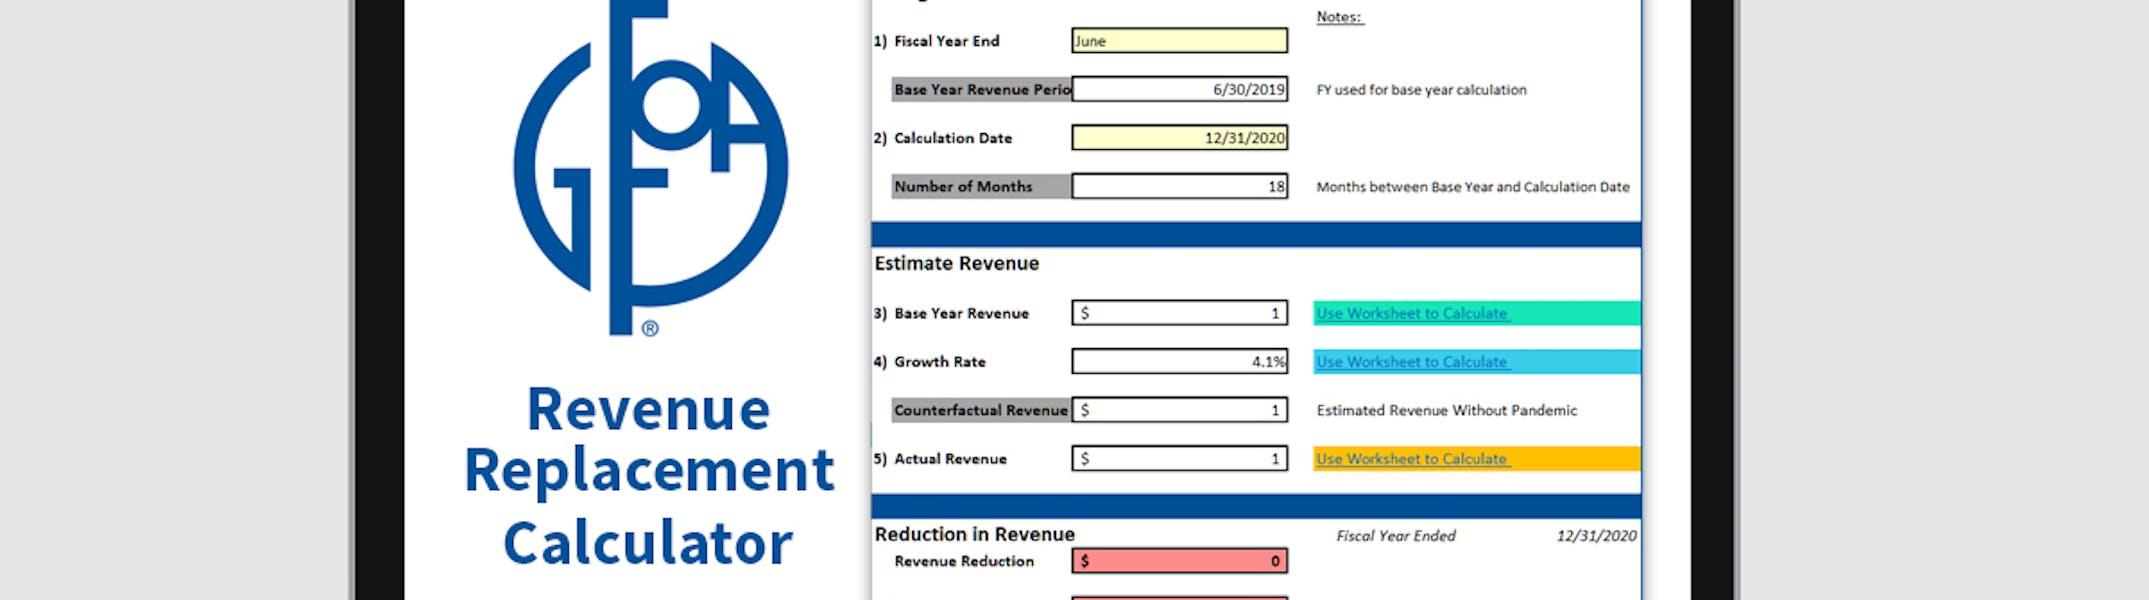 Revenue Replacement Calculator Photo